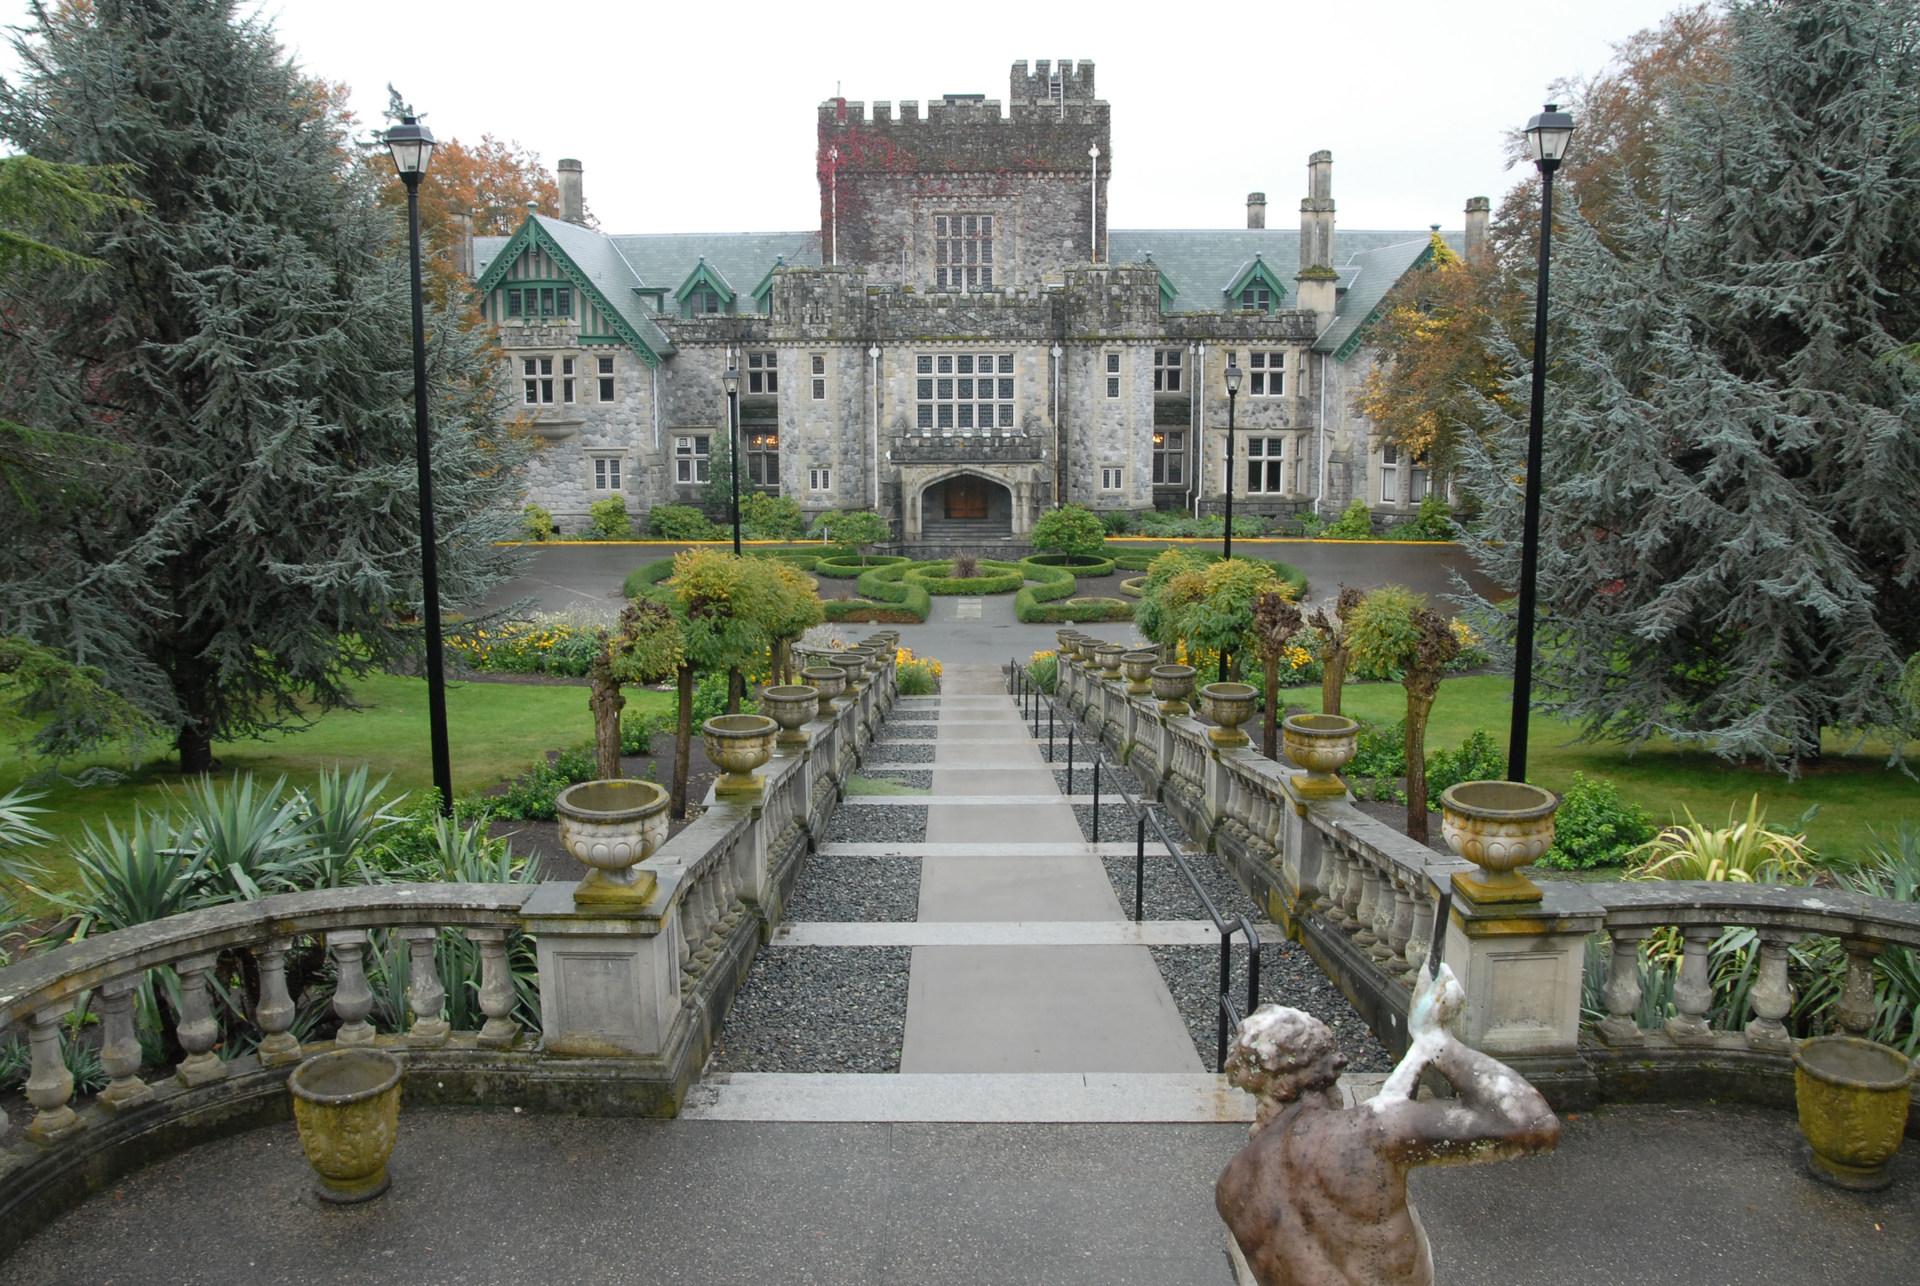 royal roads university online application